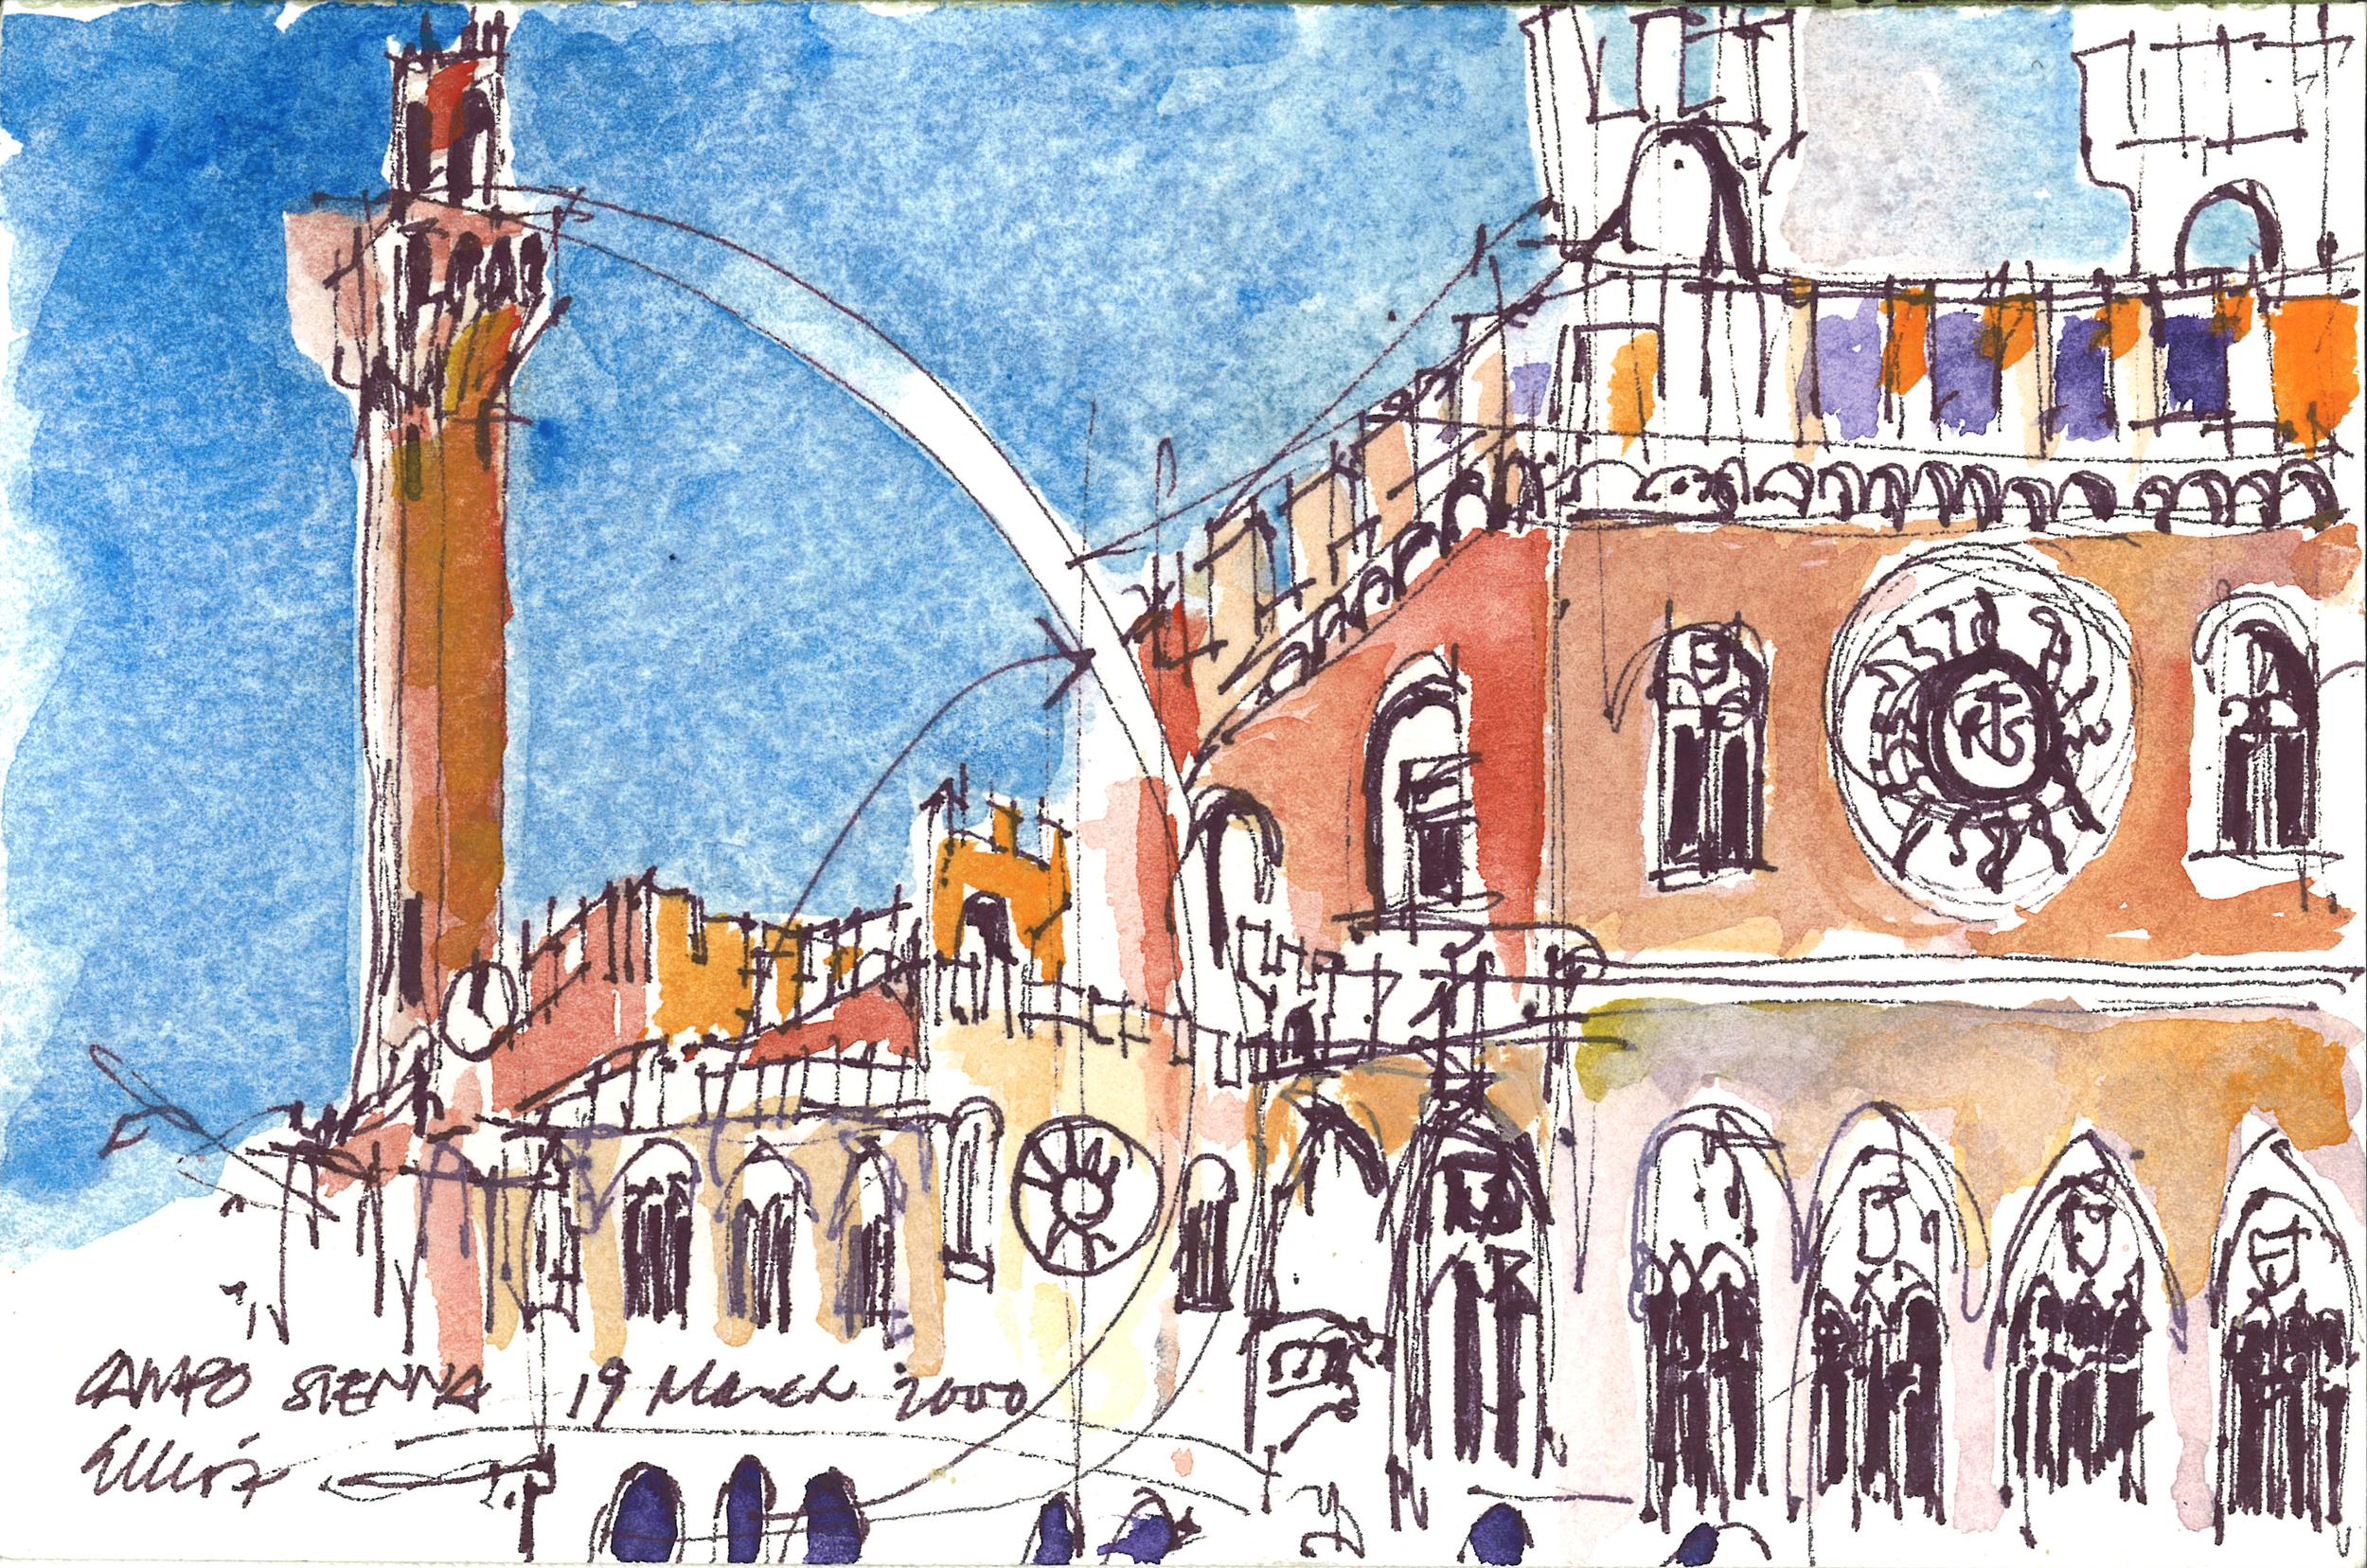 Piazza del Campo Tower, Sienna